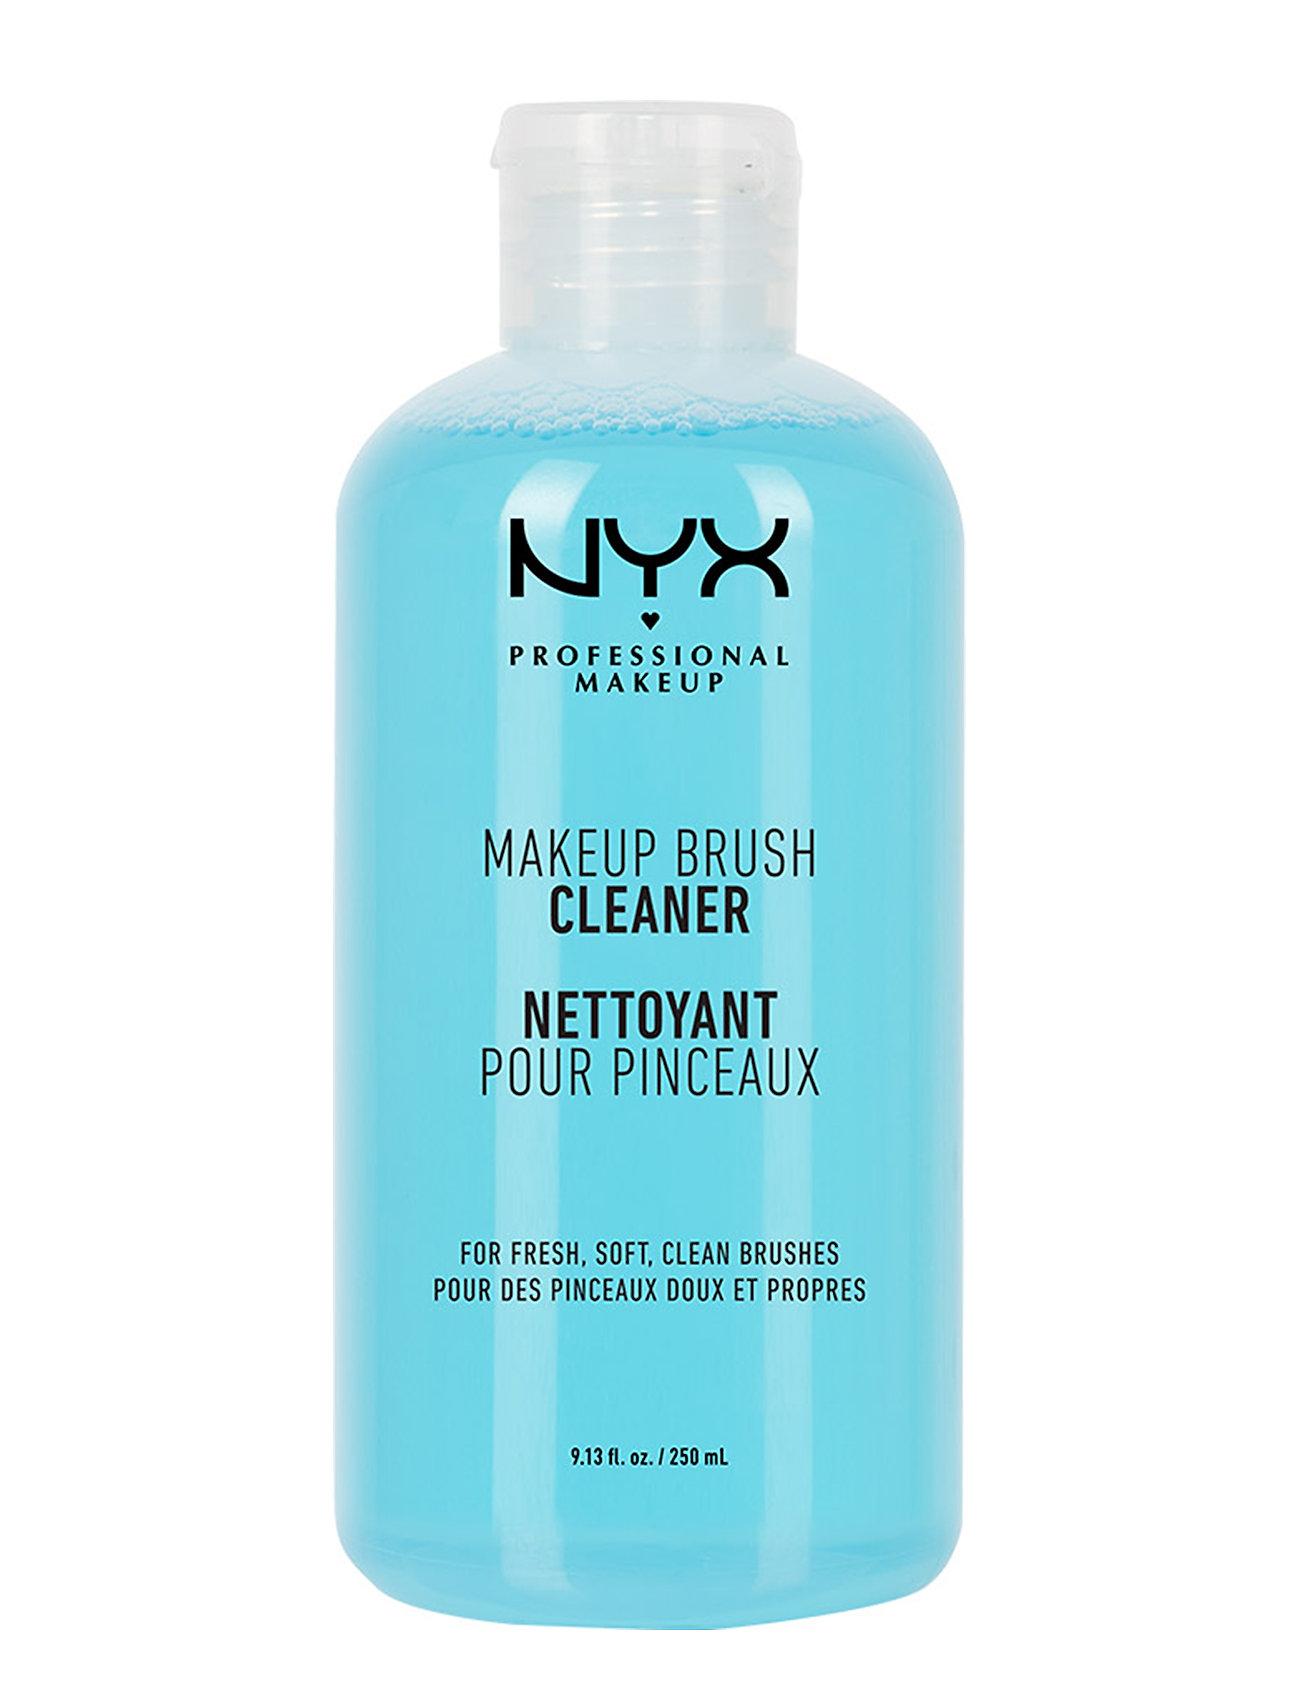 Image of Makeup Brush Cleaner Beauty WOMEN Makeup Makeup Brushes Brush Cleaners Nude NYX PROFESSIONAL MAKEUP (3410470209)